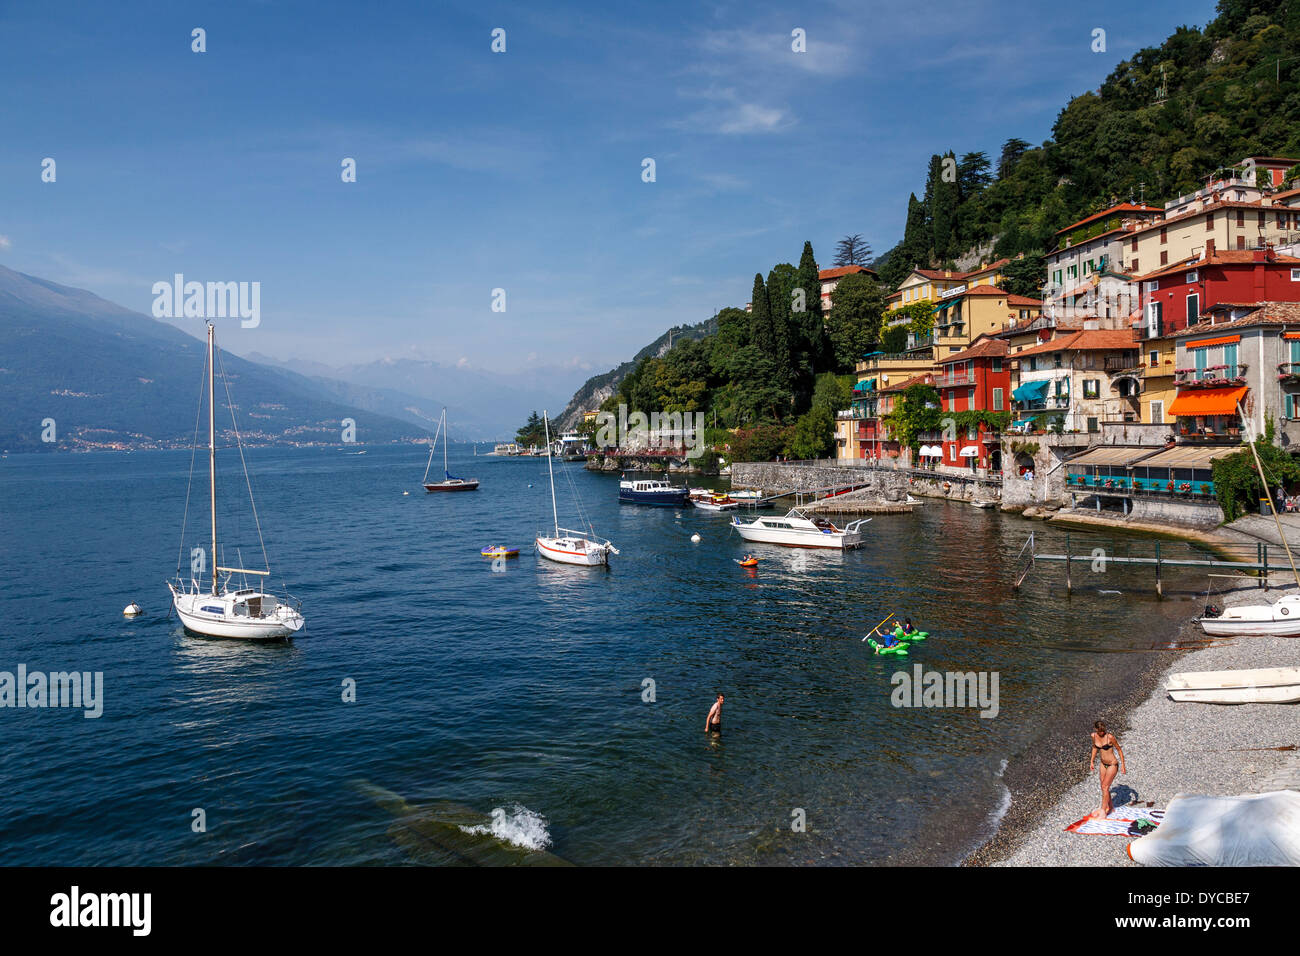 Varenna, Lake Como, Italy - Stock Image